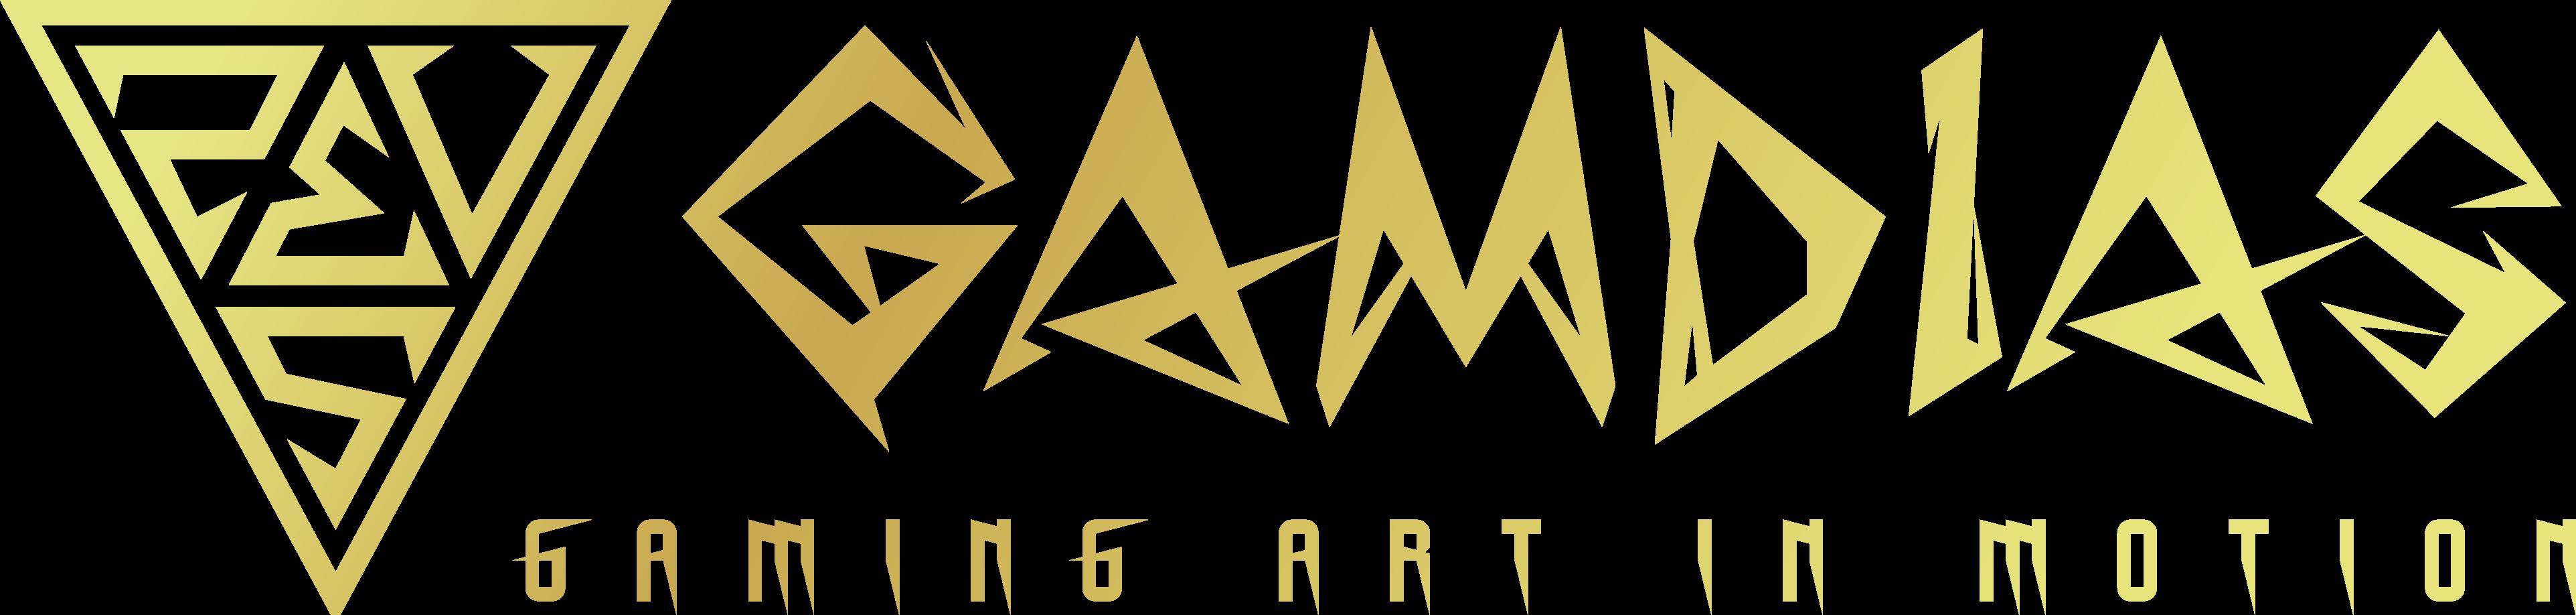 Gd_logo_glod_main